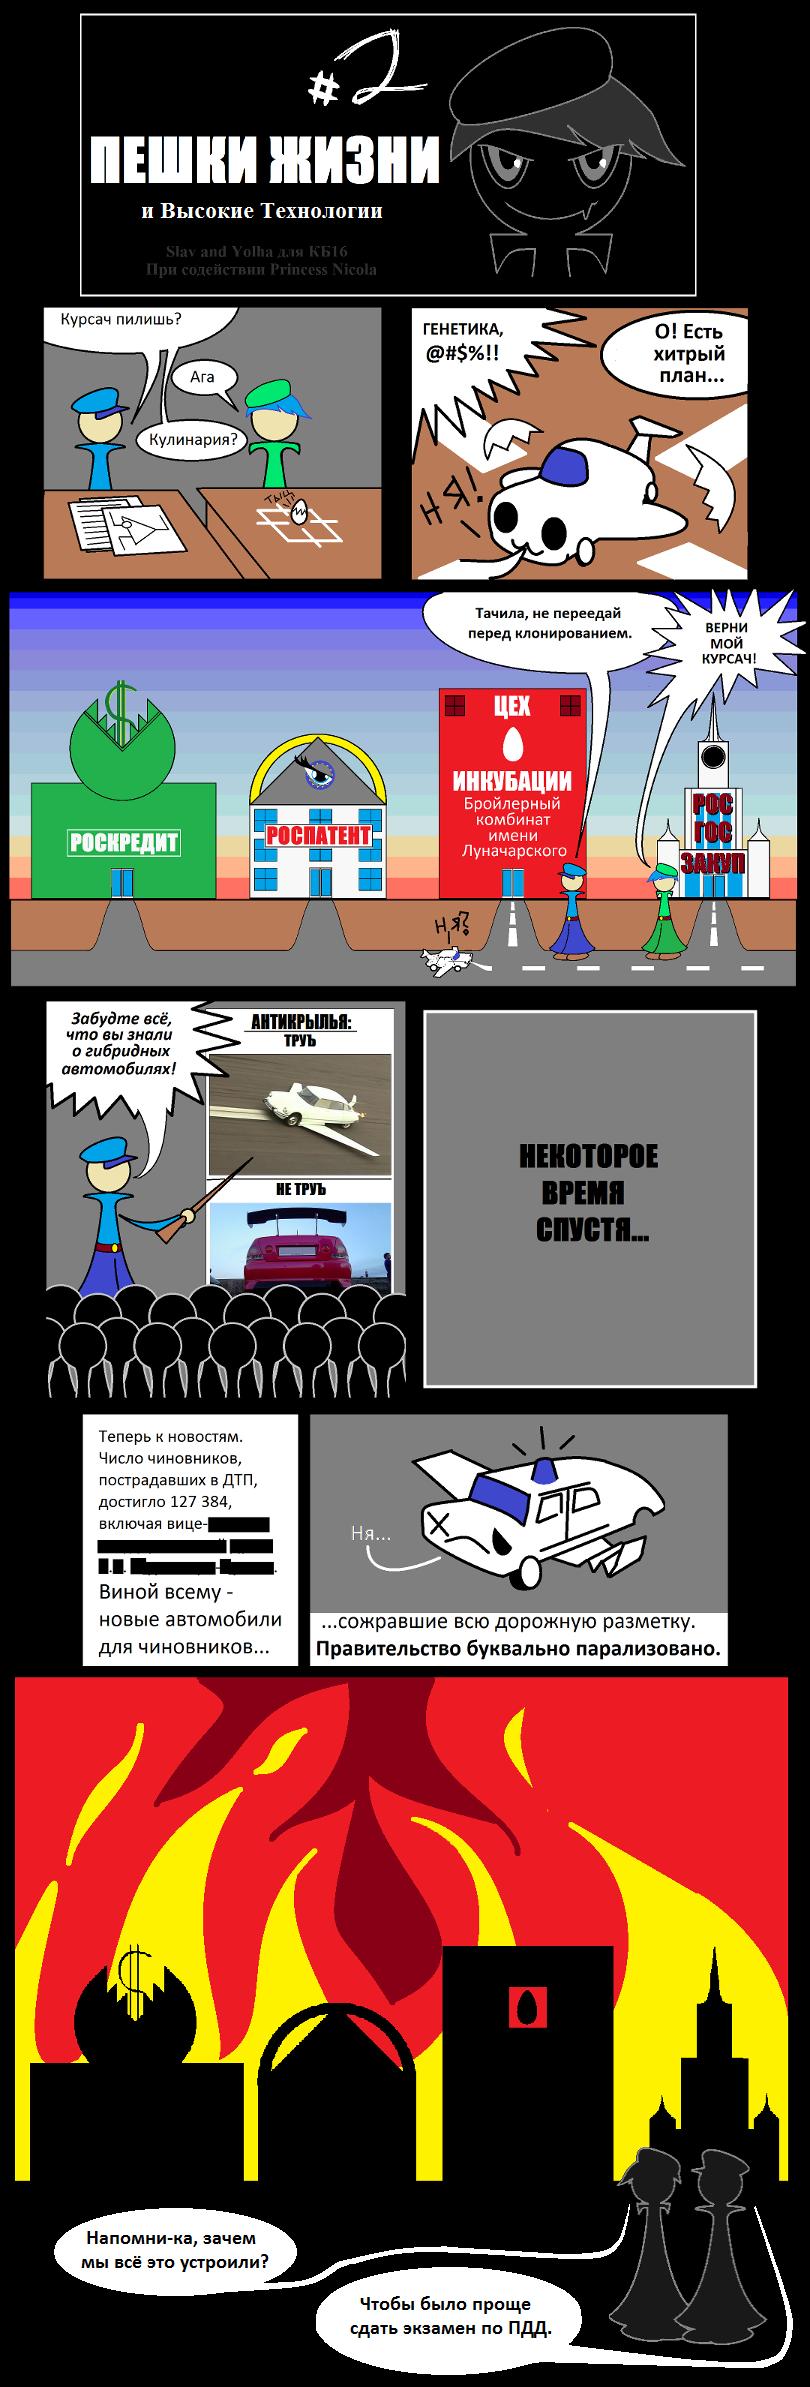 Комикс битва №16 выпуск 102